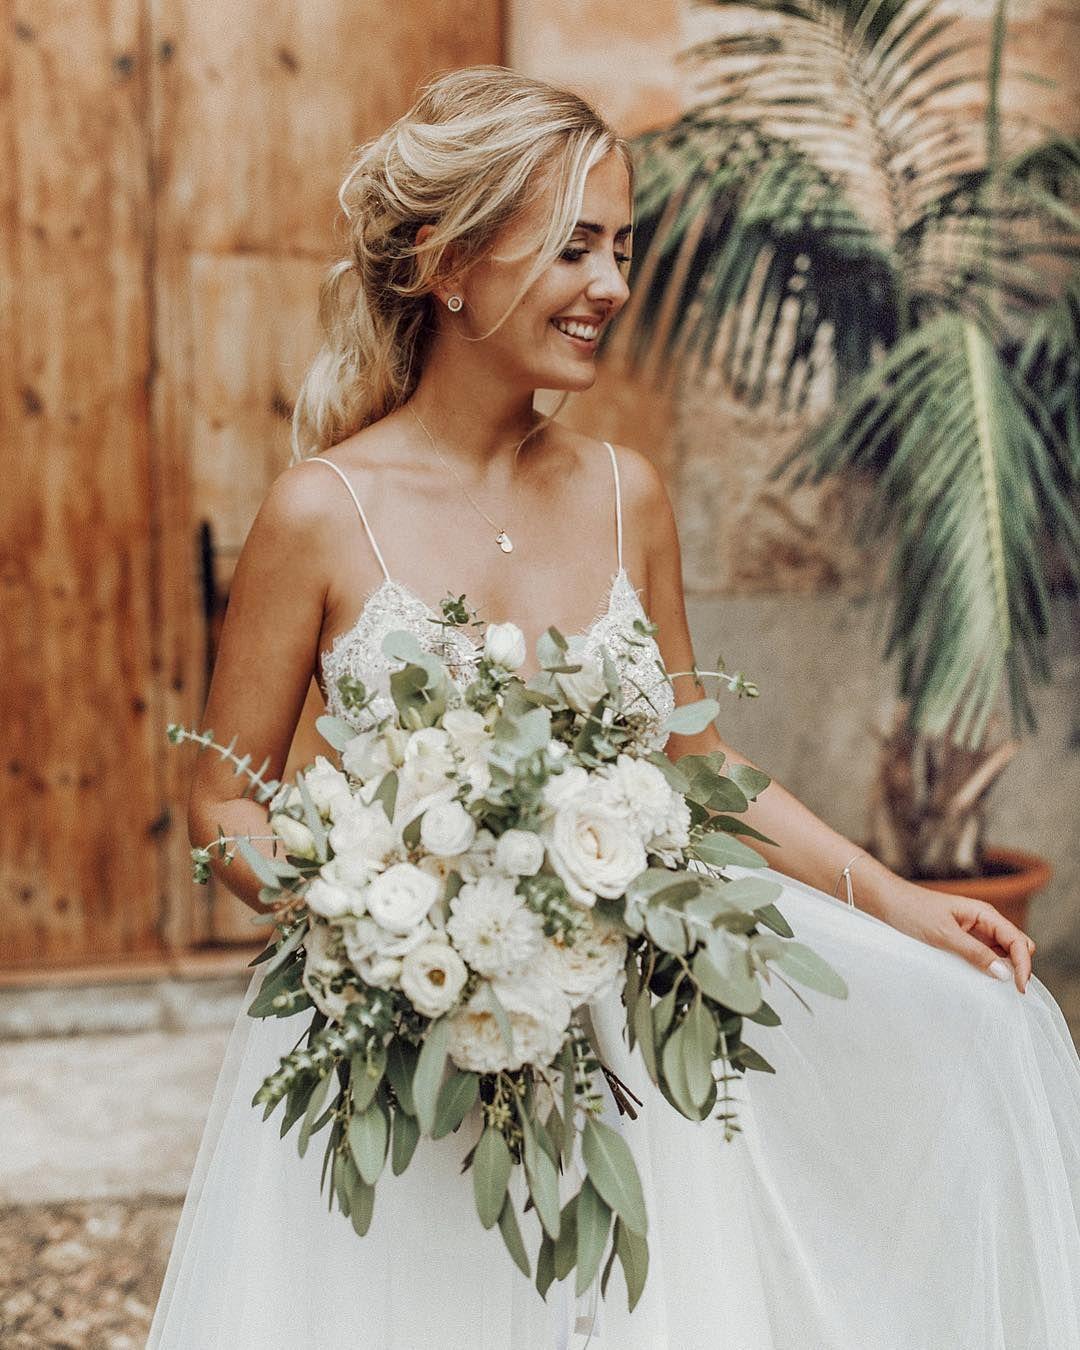 No lace wedding dress october 2018 Pin by Jasmine Mitchum on  Wedding in   Pinterest  Wedding